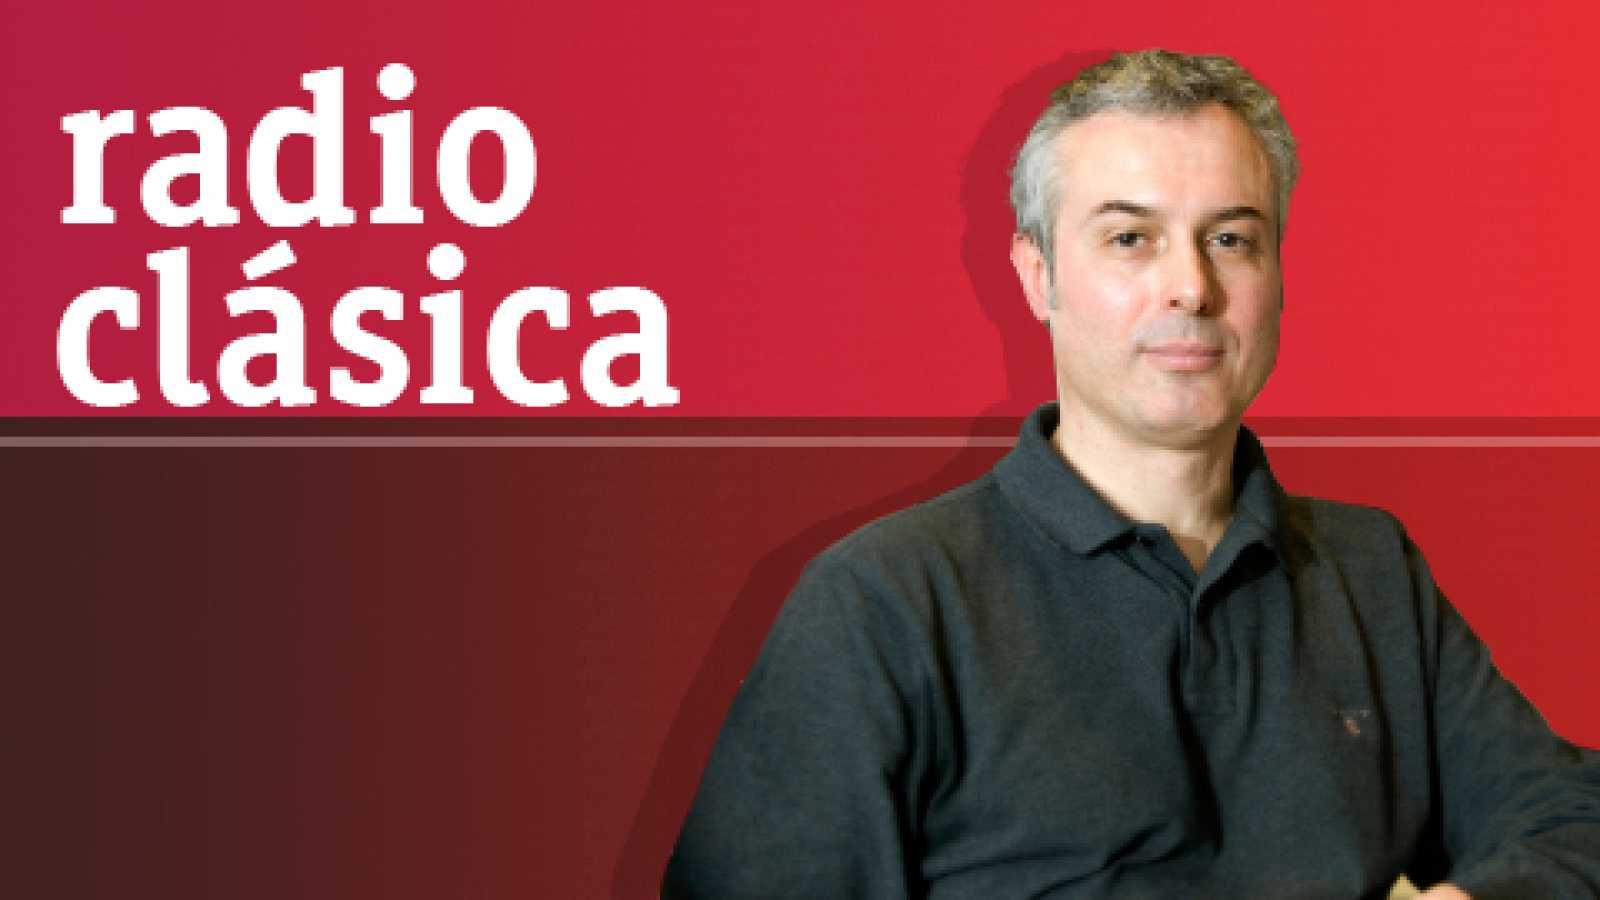 Músicas de España - Aniversario de Jesús Guridi - 12/05/11 - Escuchar ahora